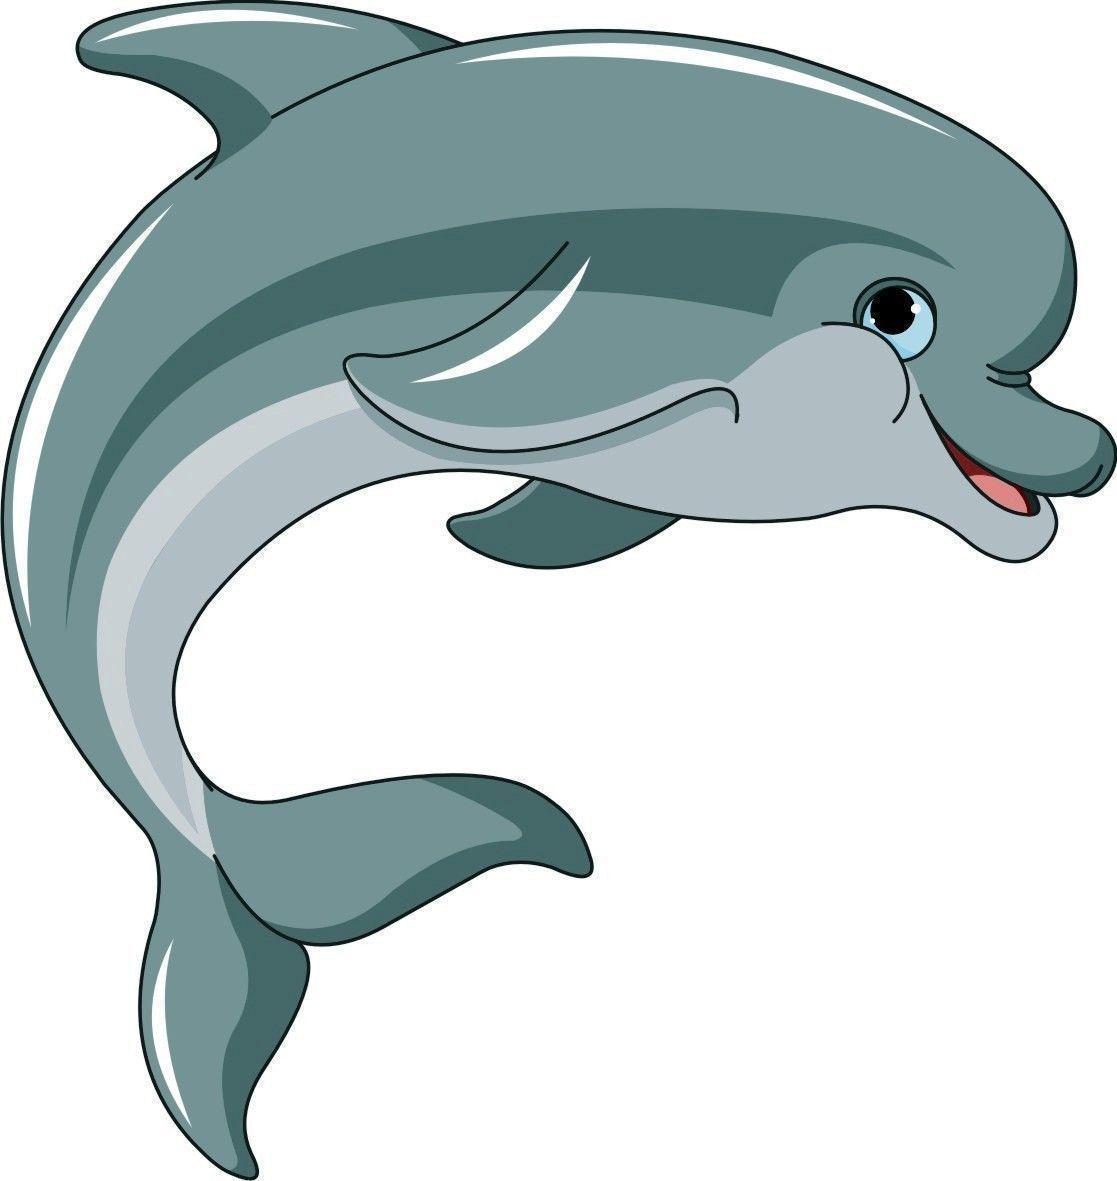 Dolphin clipart flipper. Cartoon sticker decal graphic